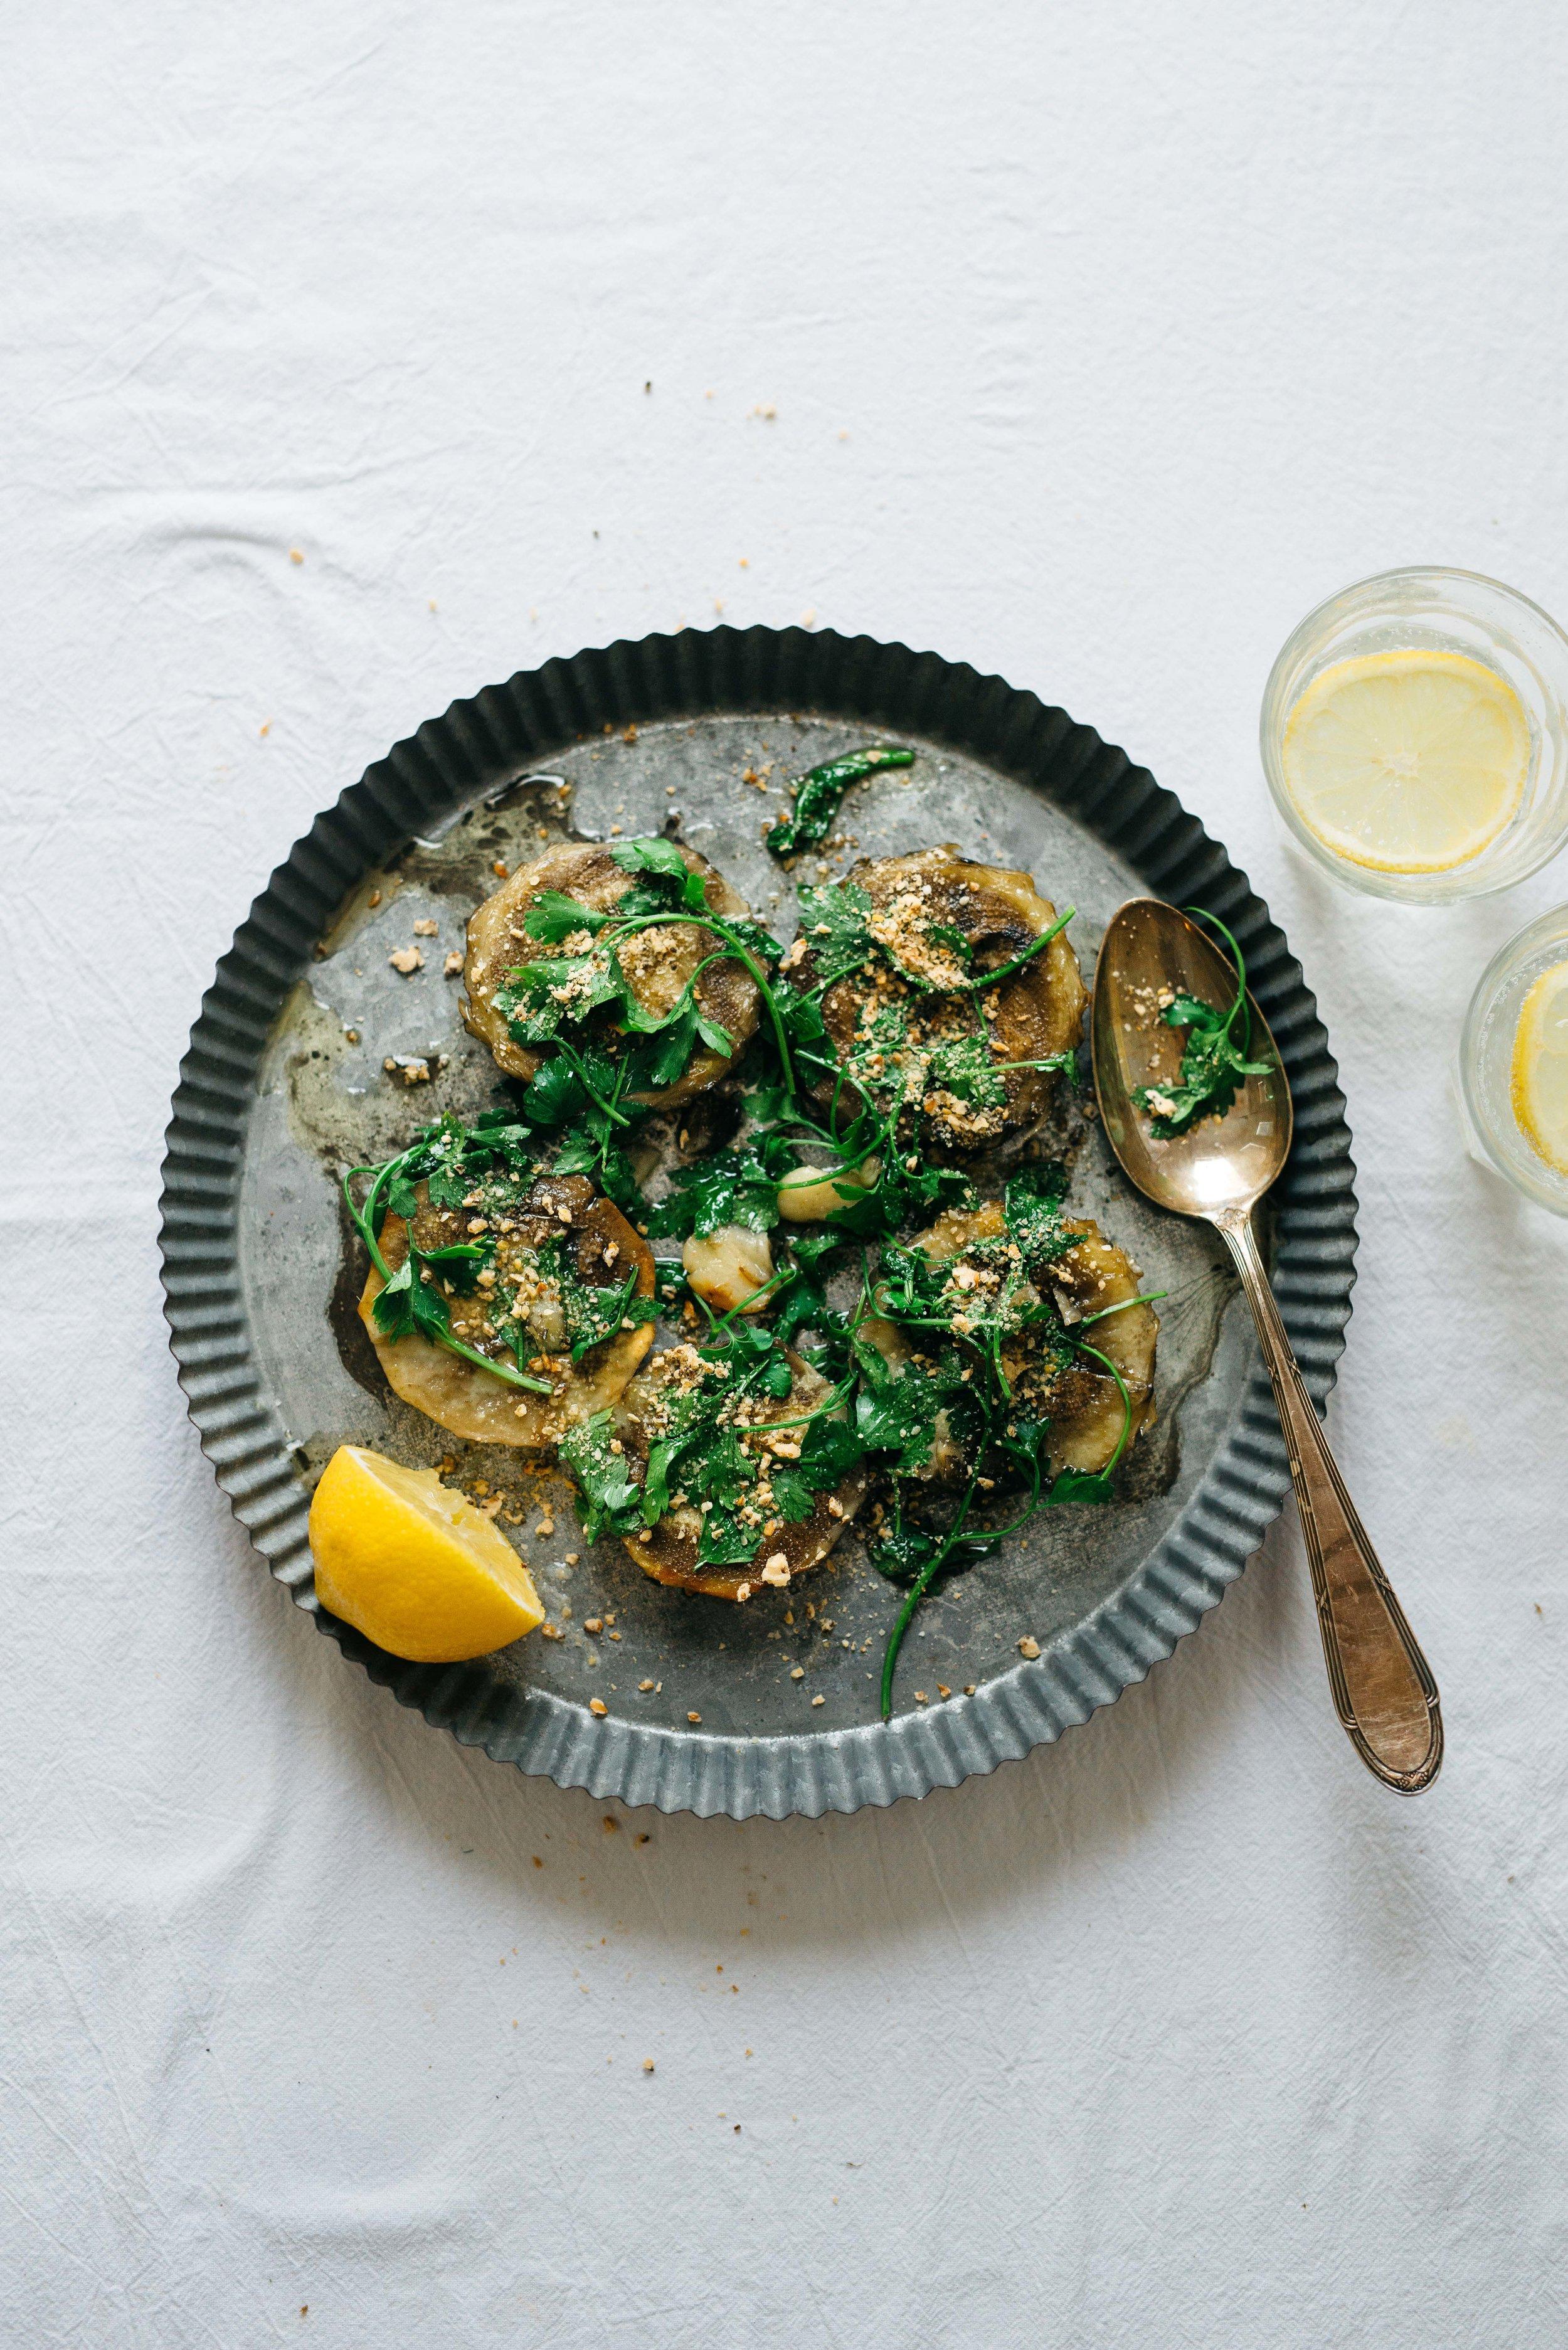 Pan-Fried Artichoke Hearts w/ Parsley | Dolly and Oatmeal